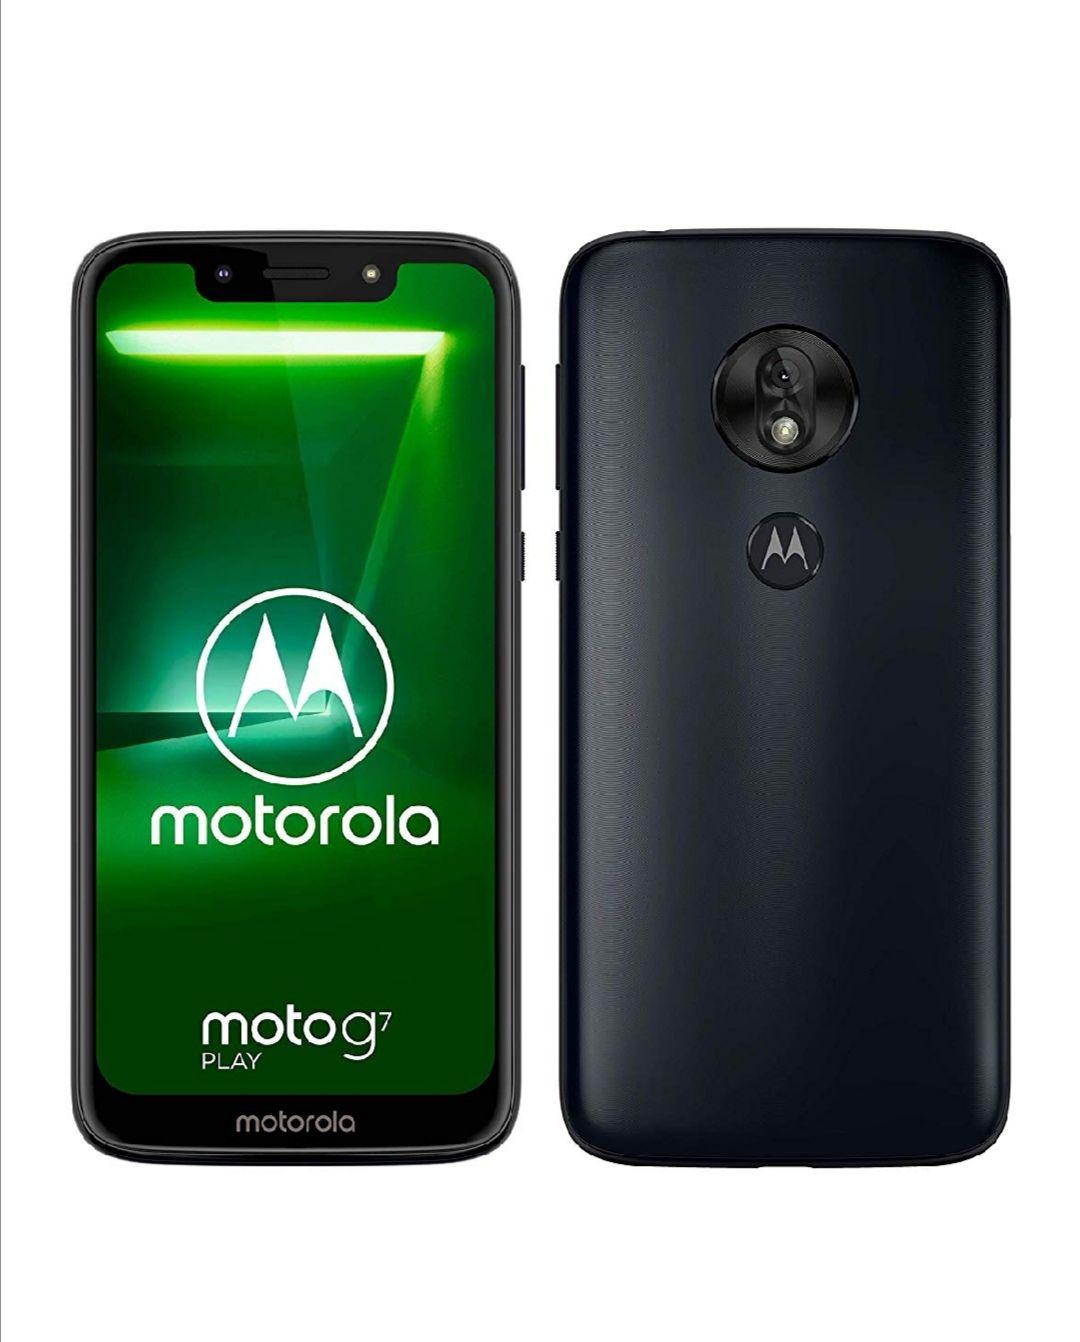 Motorola Moto g7 Play 2 GB RAM and 32 GB Smartphone £119.95 @ Amazon